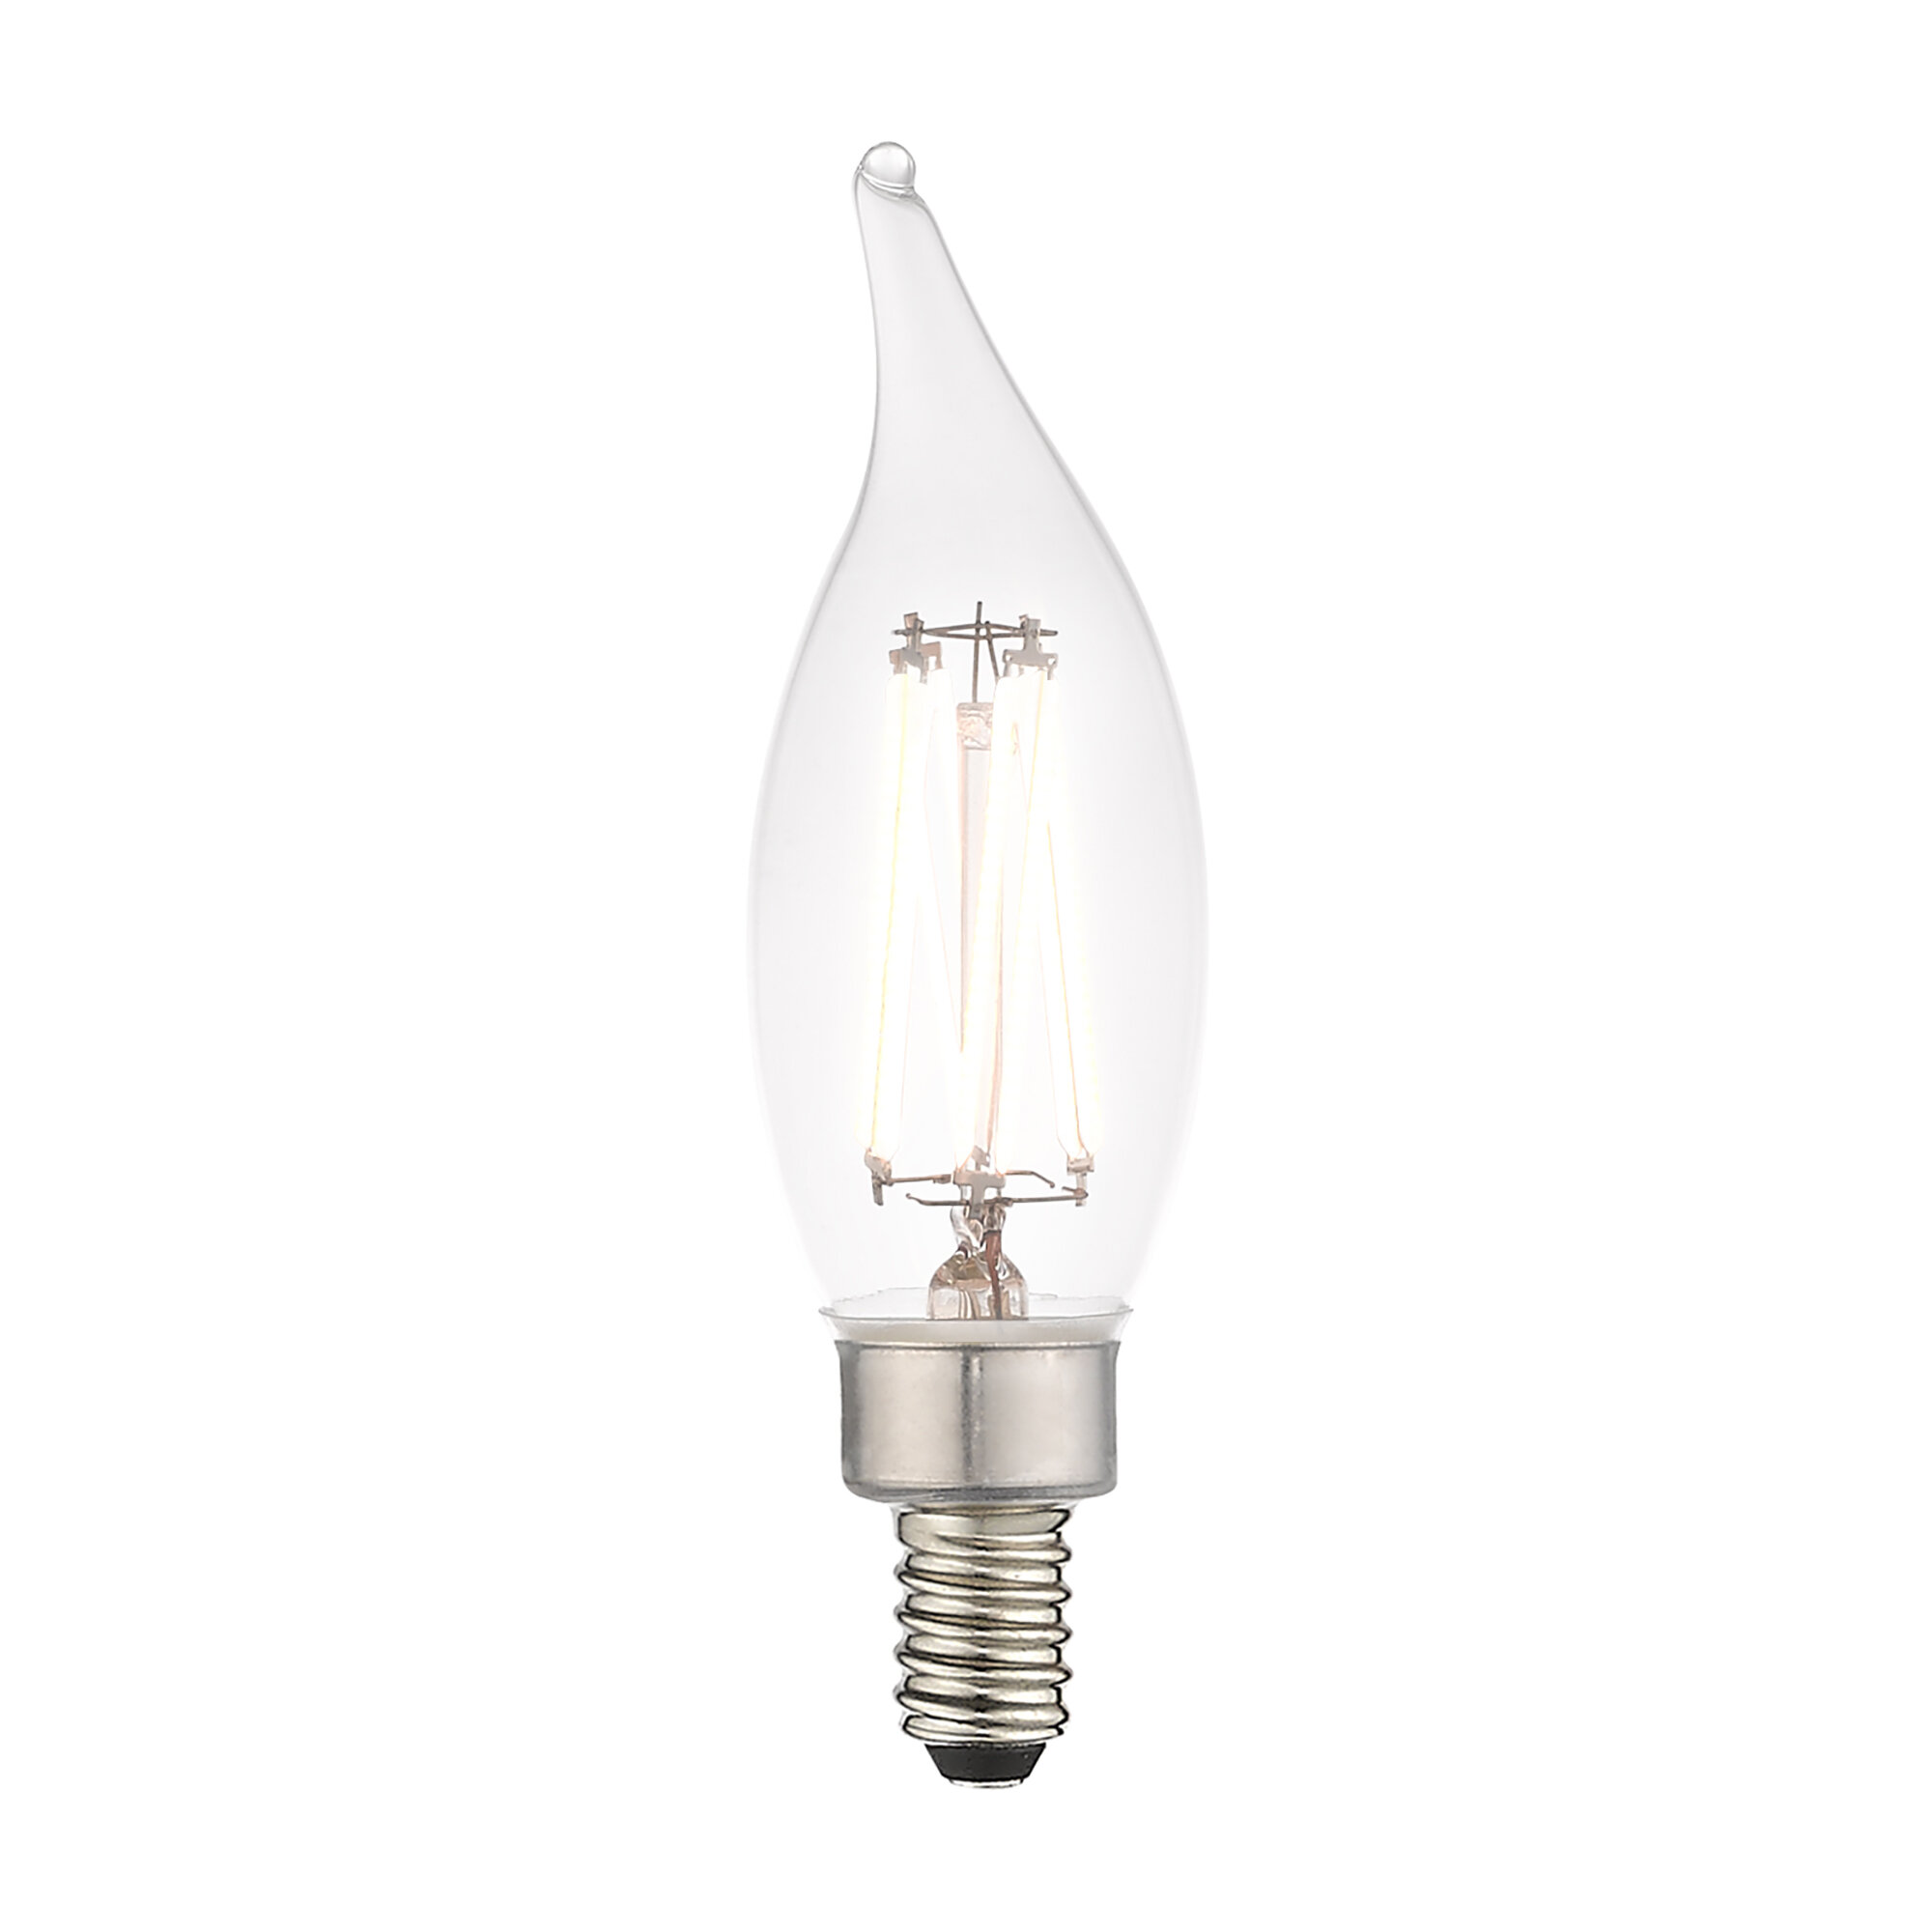 Jtechs Inc 60 Watt Equivalent Ca10 Led Dimmable Light Bulb Warm White 2700k E12 Candelabra Base Reviews Wayfair